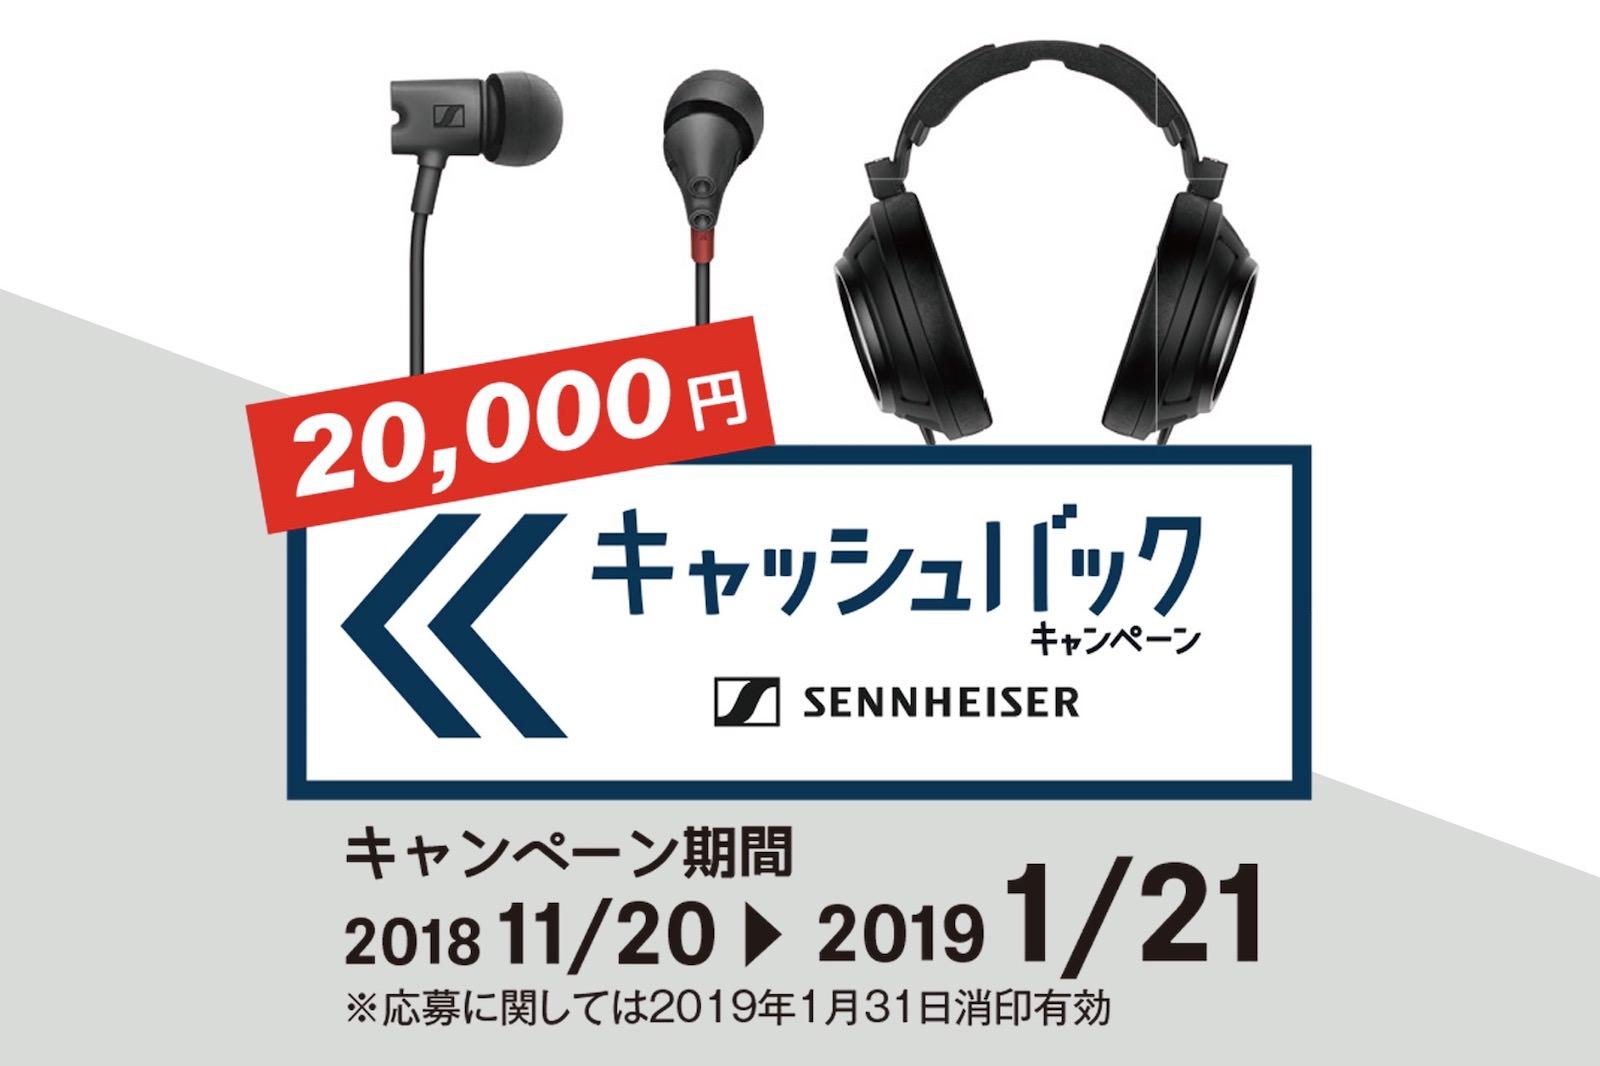 Sennheiser cash back campaign